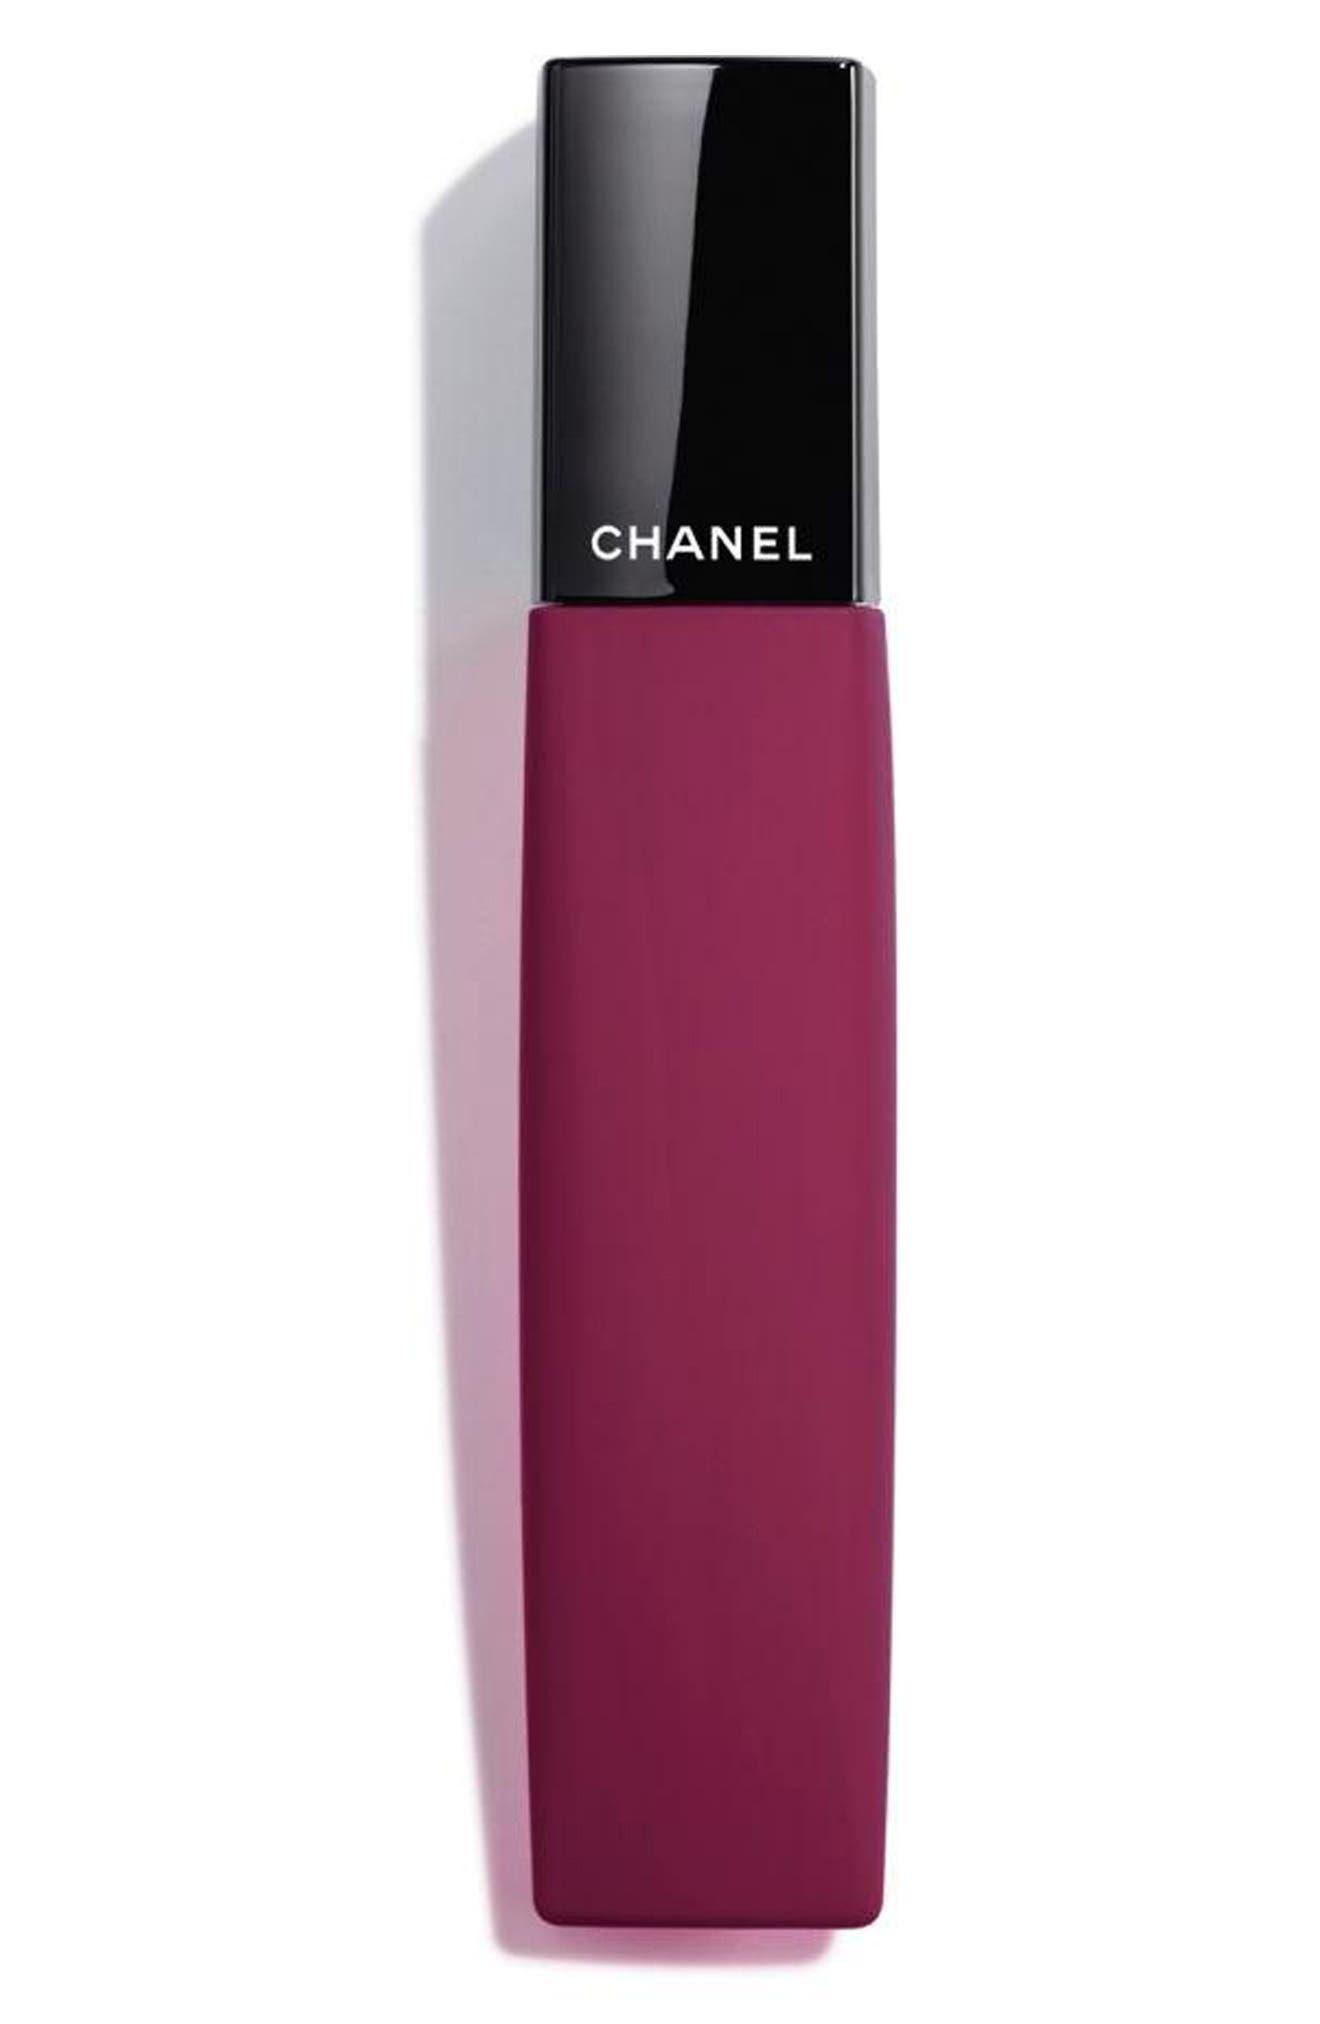 CHANEL ROUGE ALLURE LIQUID POWDER<br />Liquid Matte Lip Color, Main, color, 964 BITTERSWEET